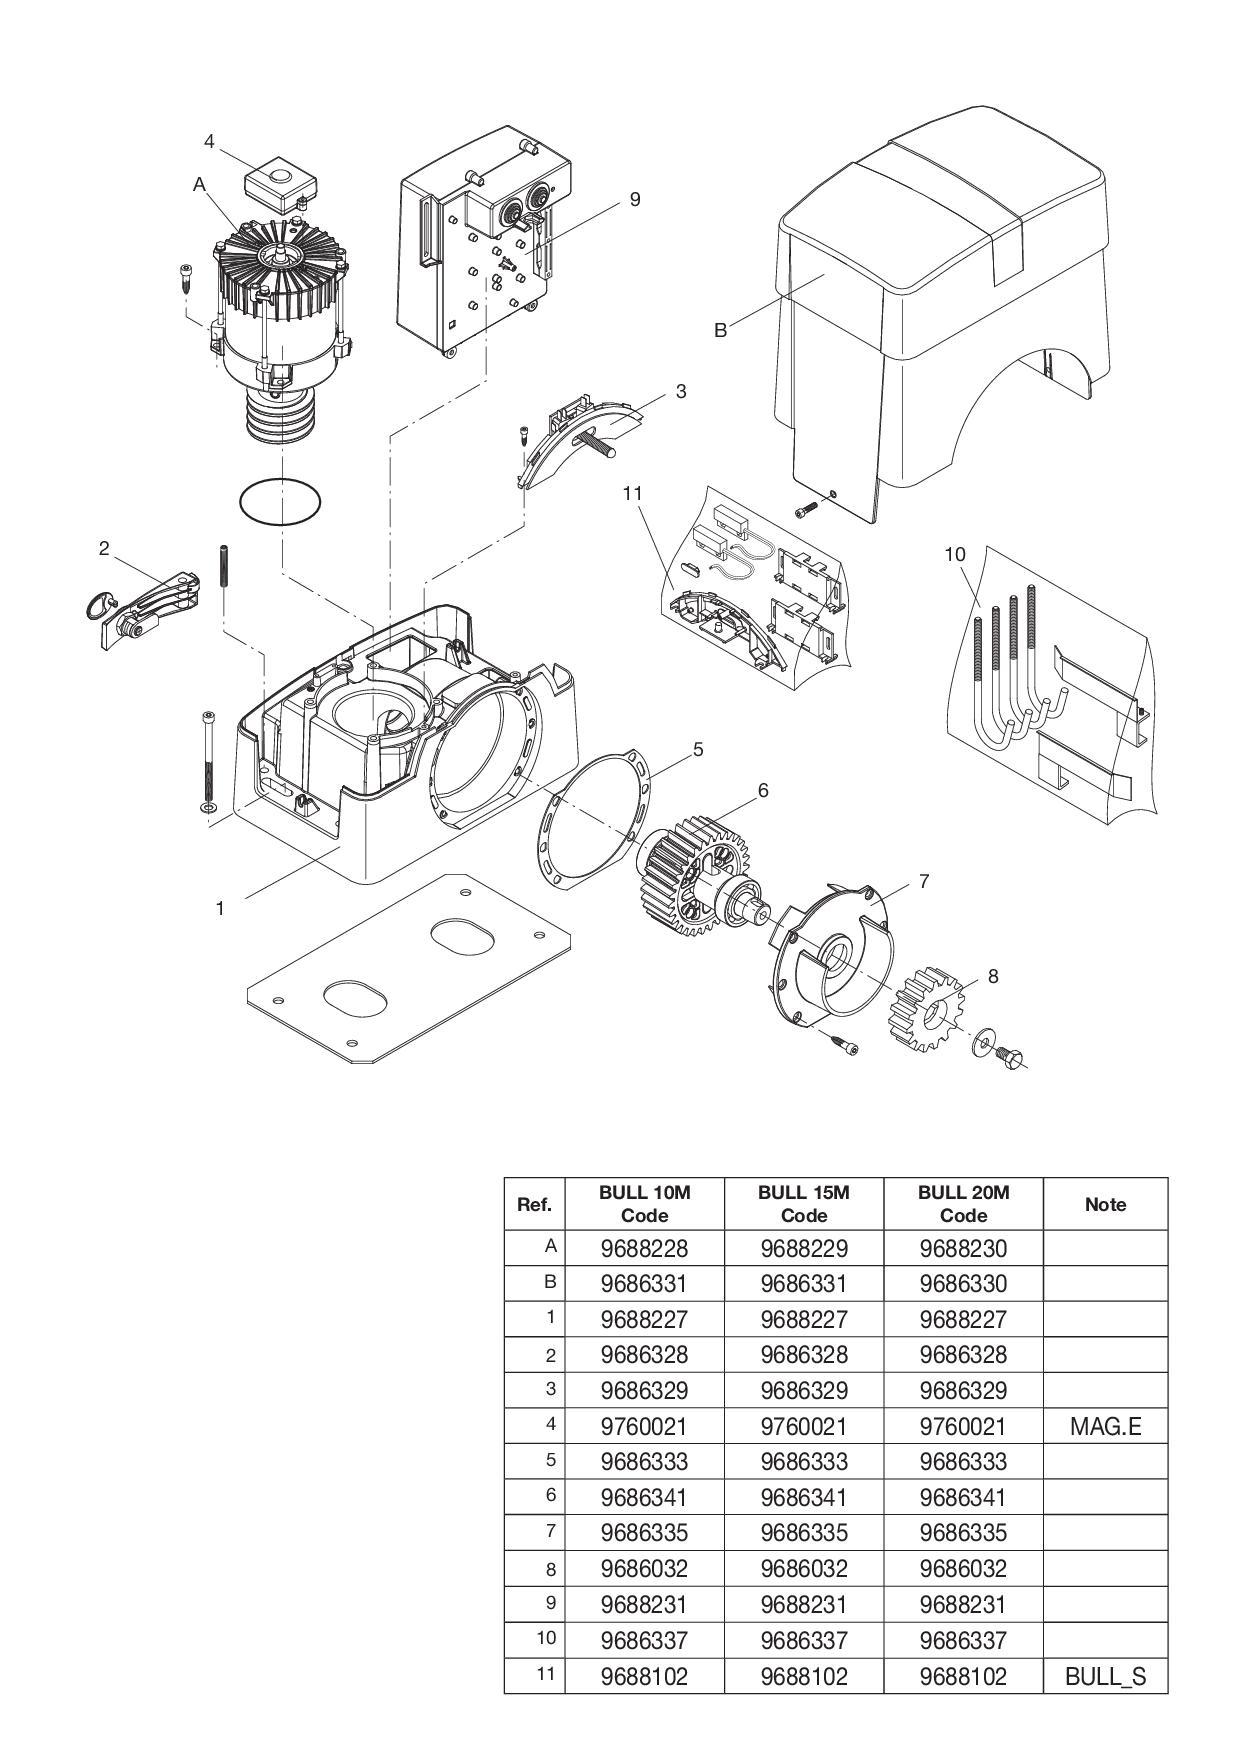 Ricambi per motore serie BULL Beninca'